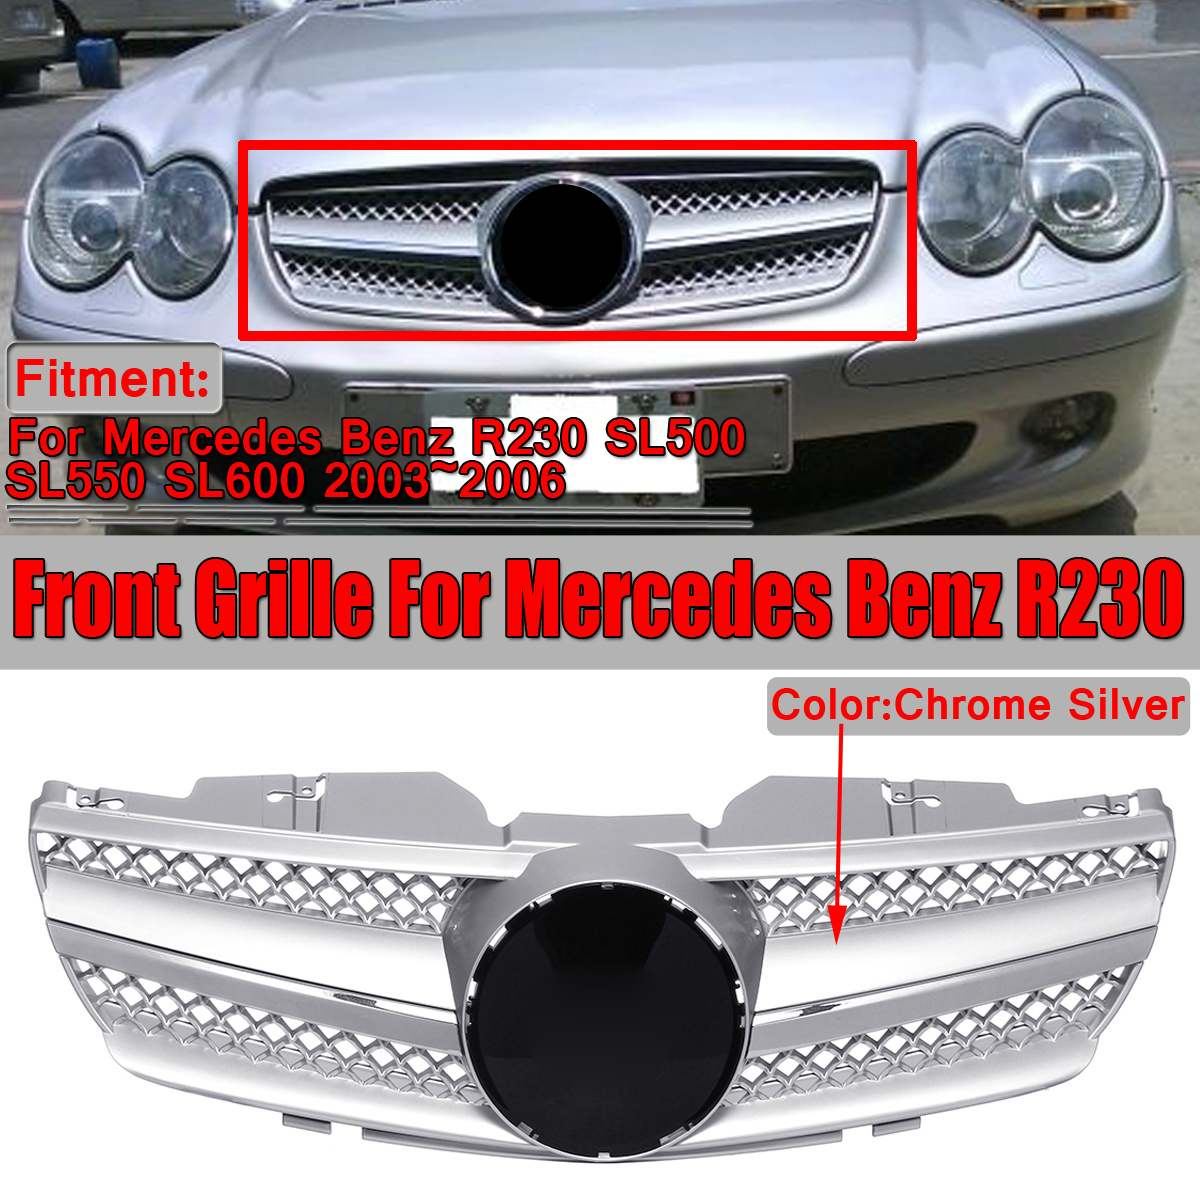 Nova R230 SL500 Grill Chrome Silver Car Amortecedor Dianteiro Grill Grille Para Mercedes Benz Para R230 SL500 SL550 SL600 2003 ~ 2006